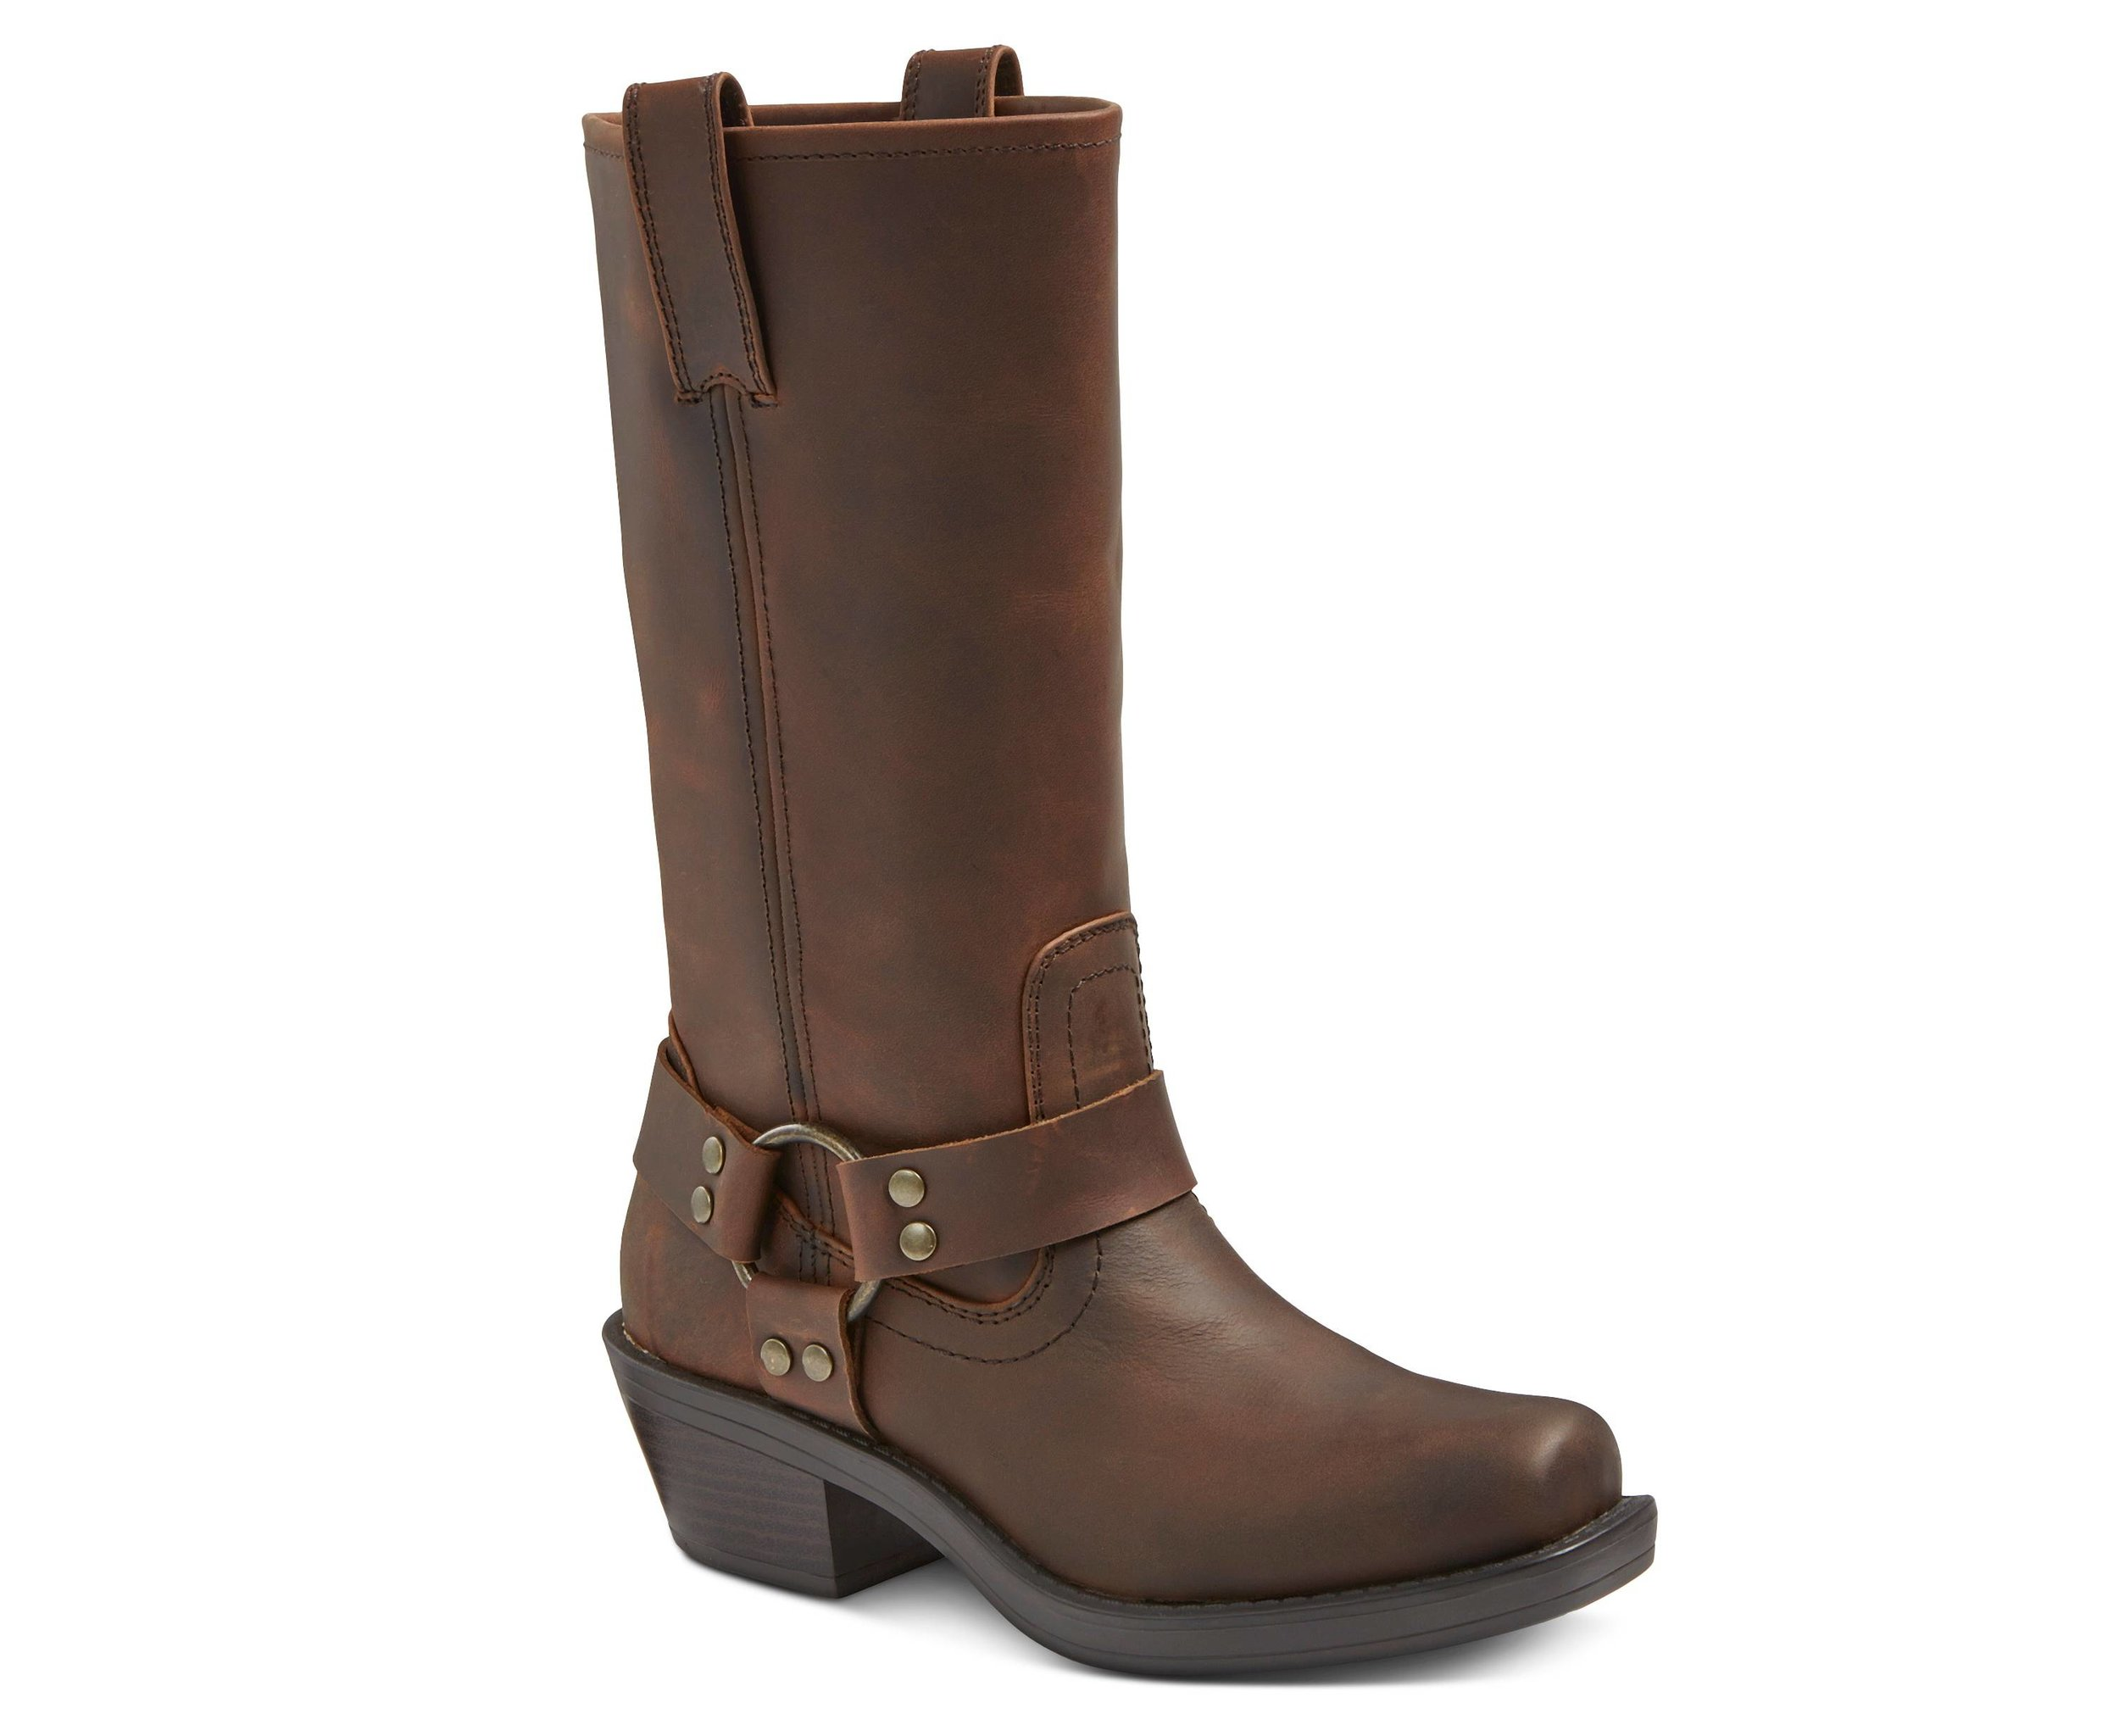 Mossimo Boot.jpg